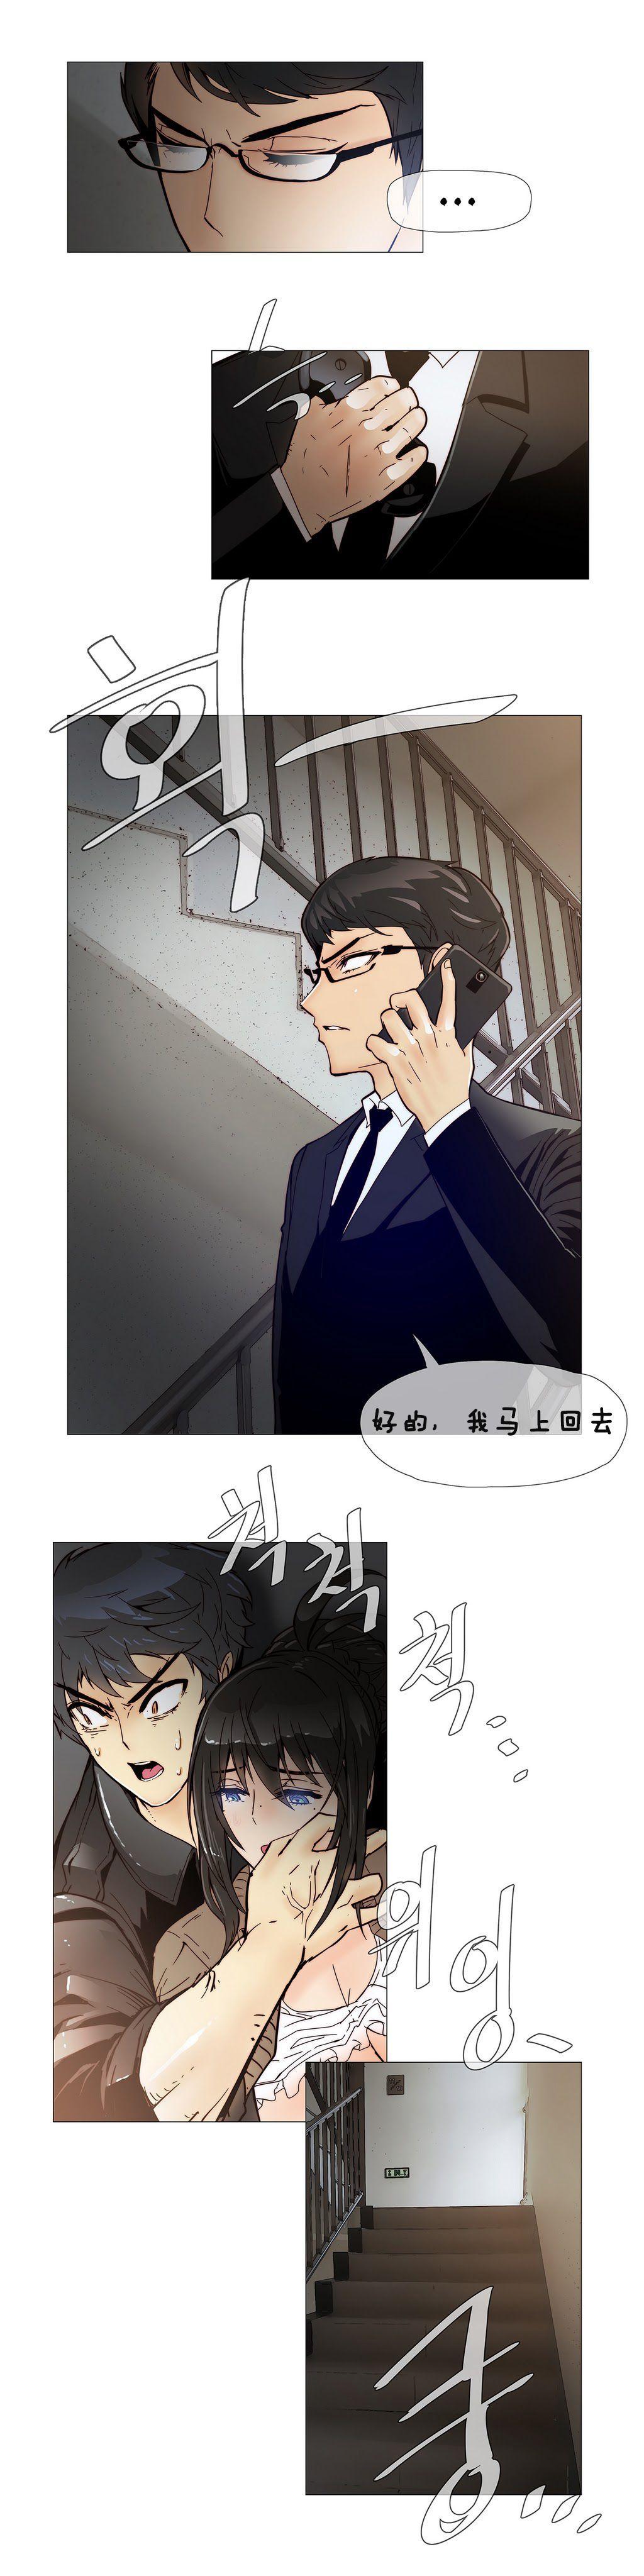 HouseHold Affairs 【卞赤鲤个人汉化】1~33话(持续更新中) 149